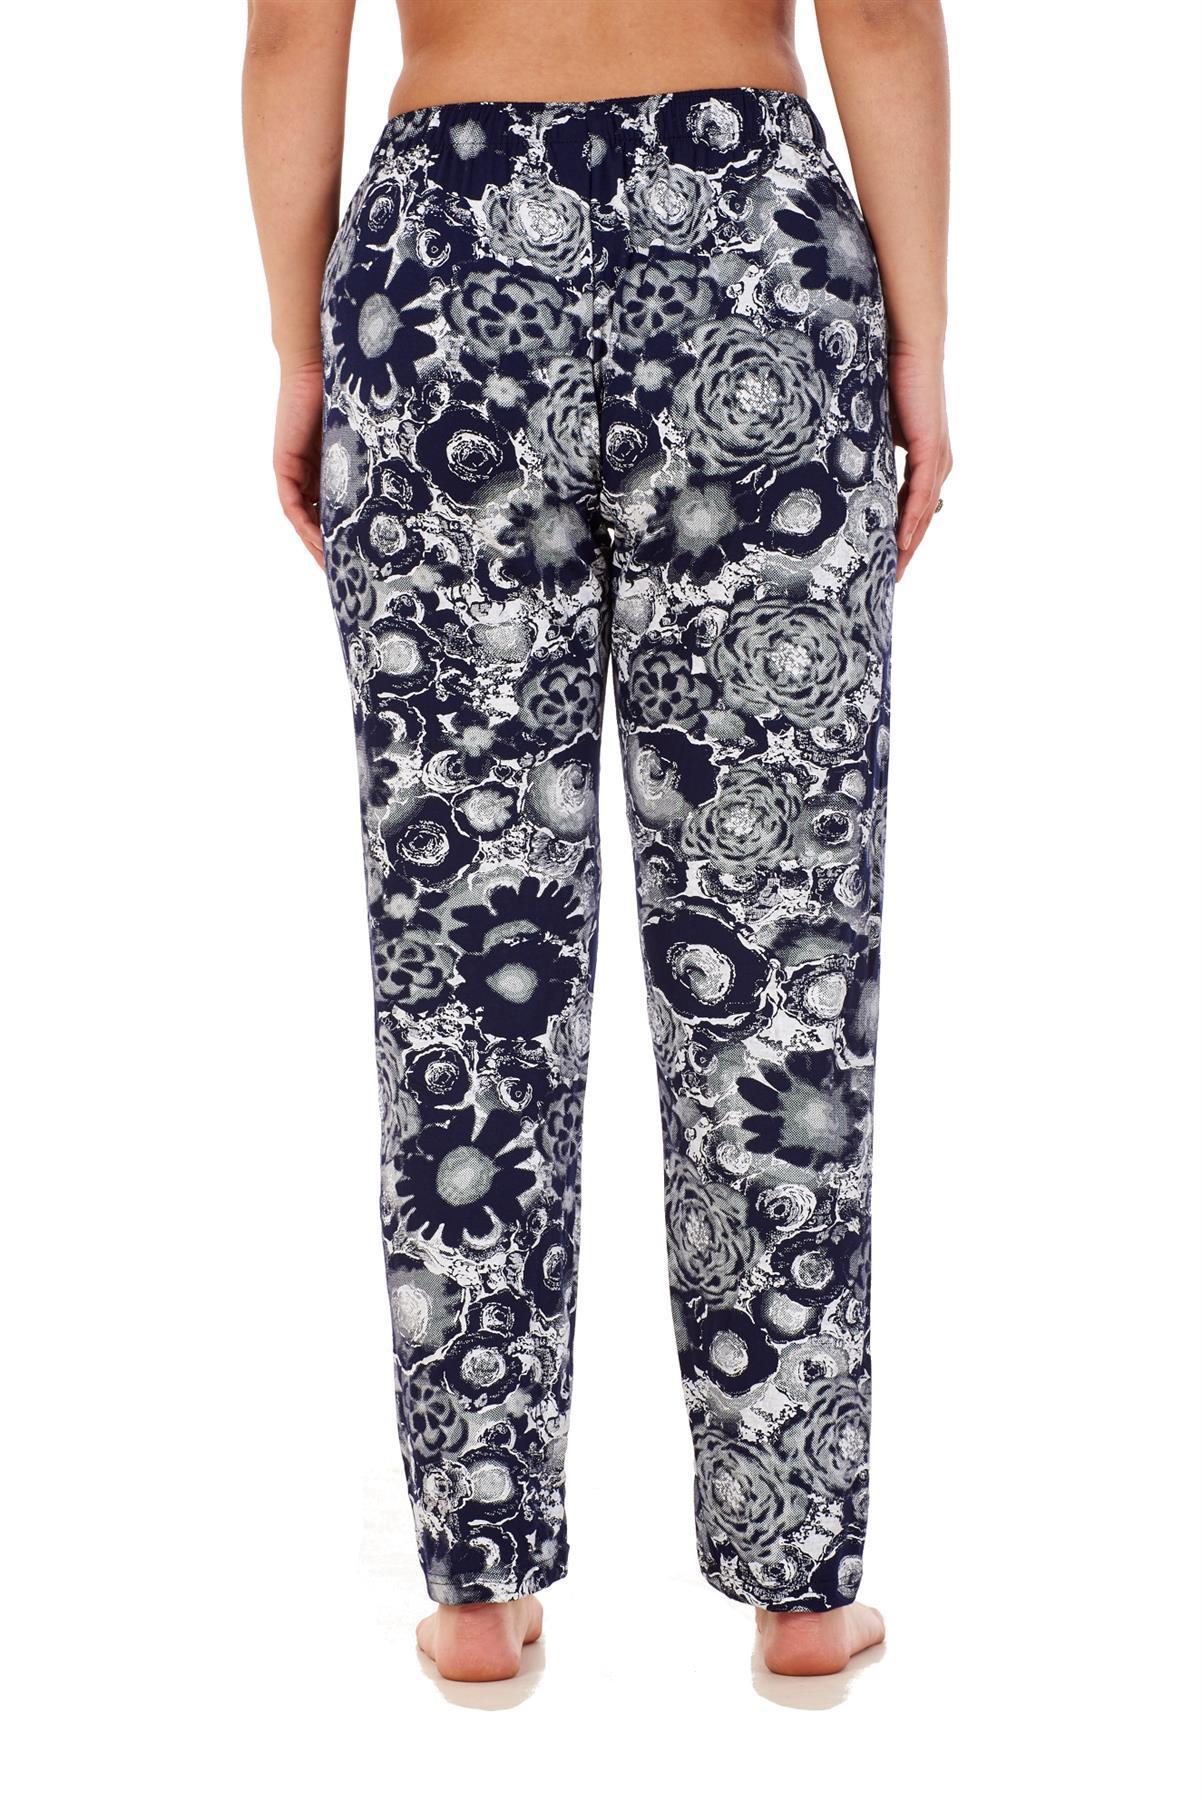 Ladies-Women-Trouser-Elasticated-Printed-Tapered-Harem-High-waist-Regular-Pants thumbnail 8